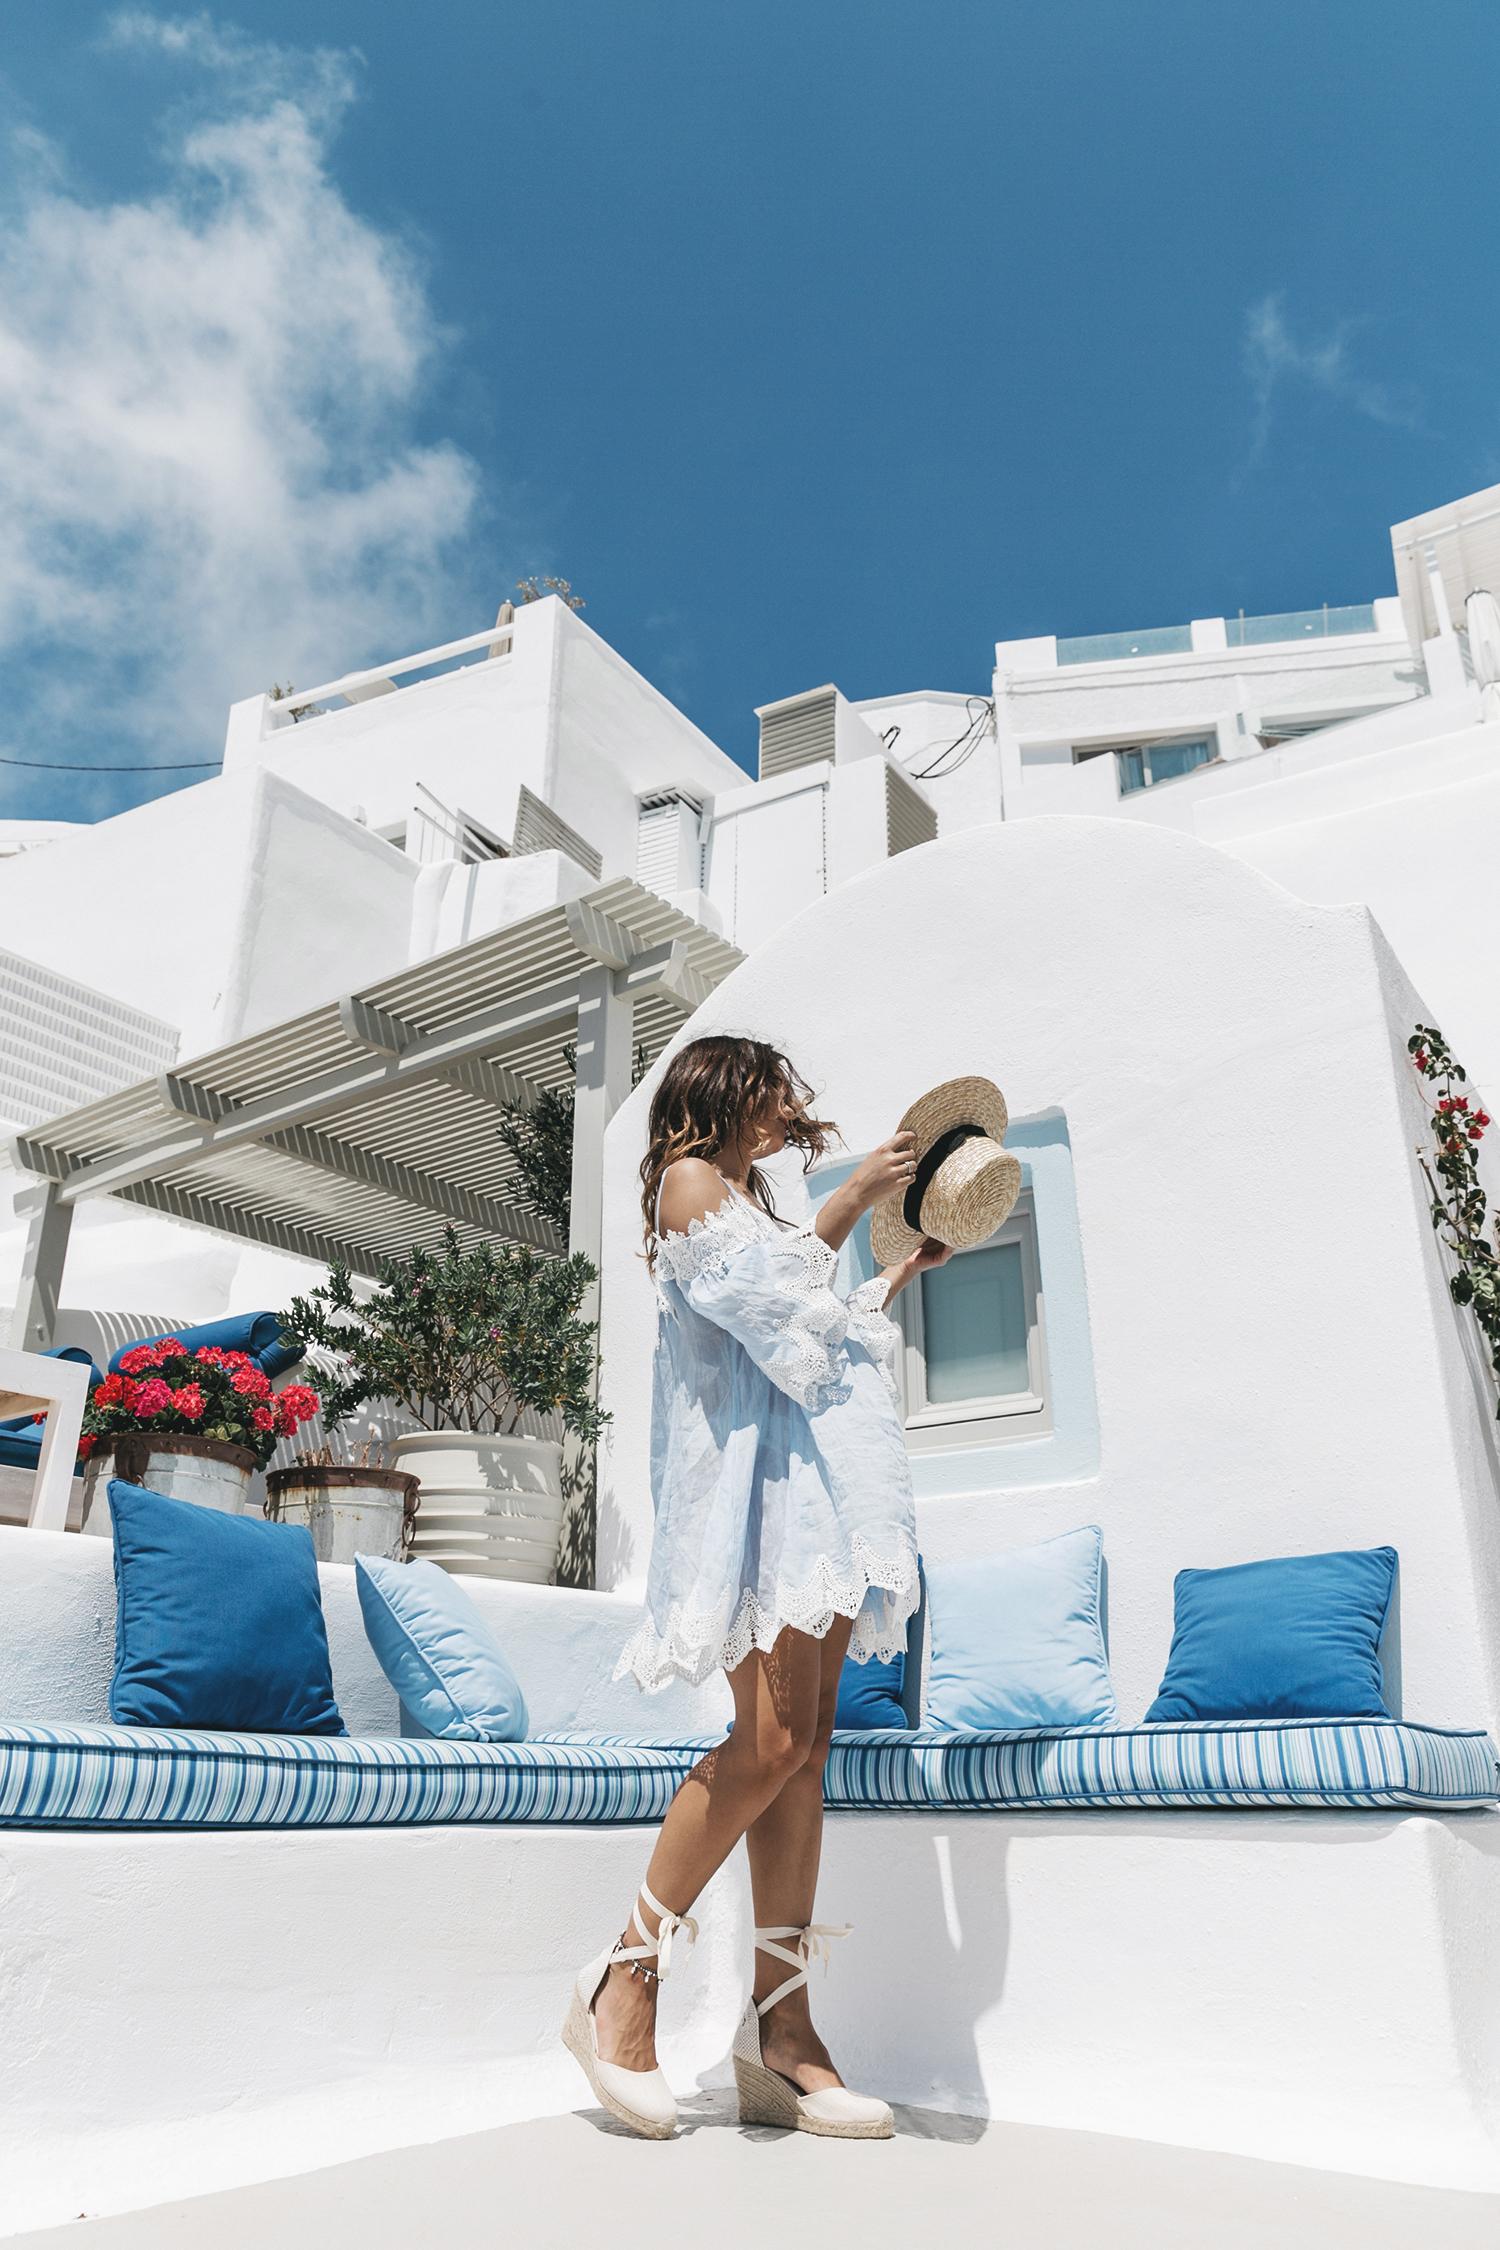 Blue_Dress-Soludos_Escapes-Soludos_Espadrilles-Canotier-Hat-Lack_Of_Color-Summer-Santorini-Collage_Vintage-25